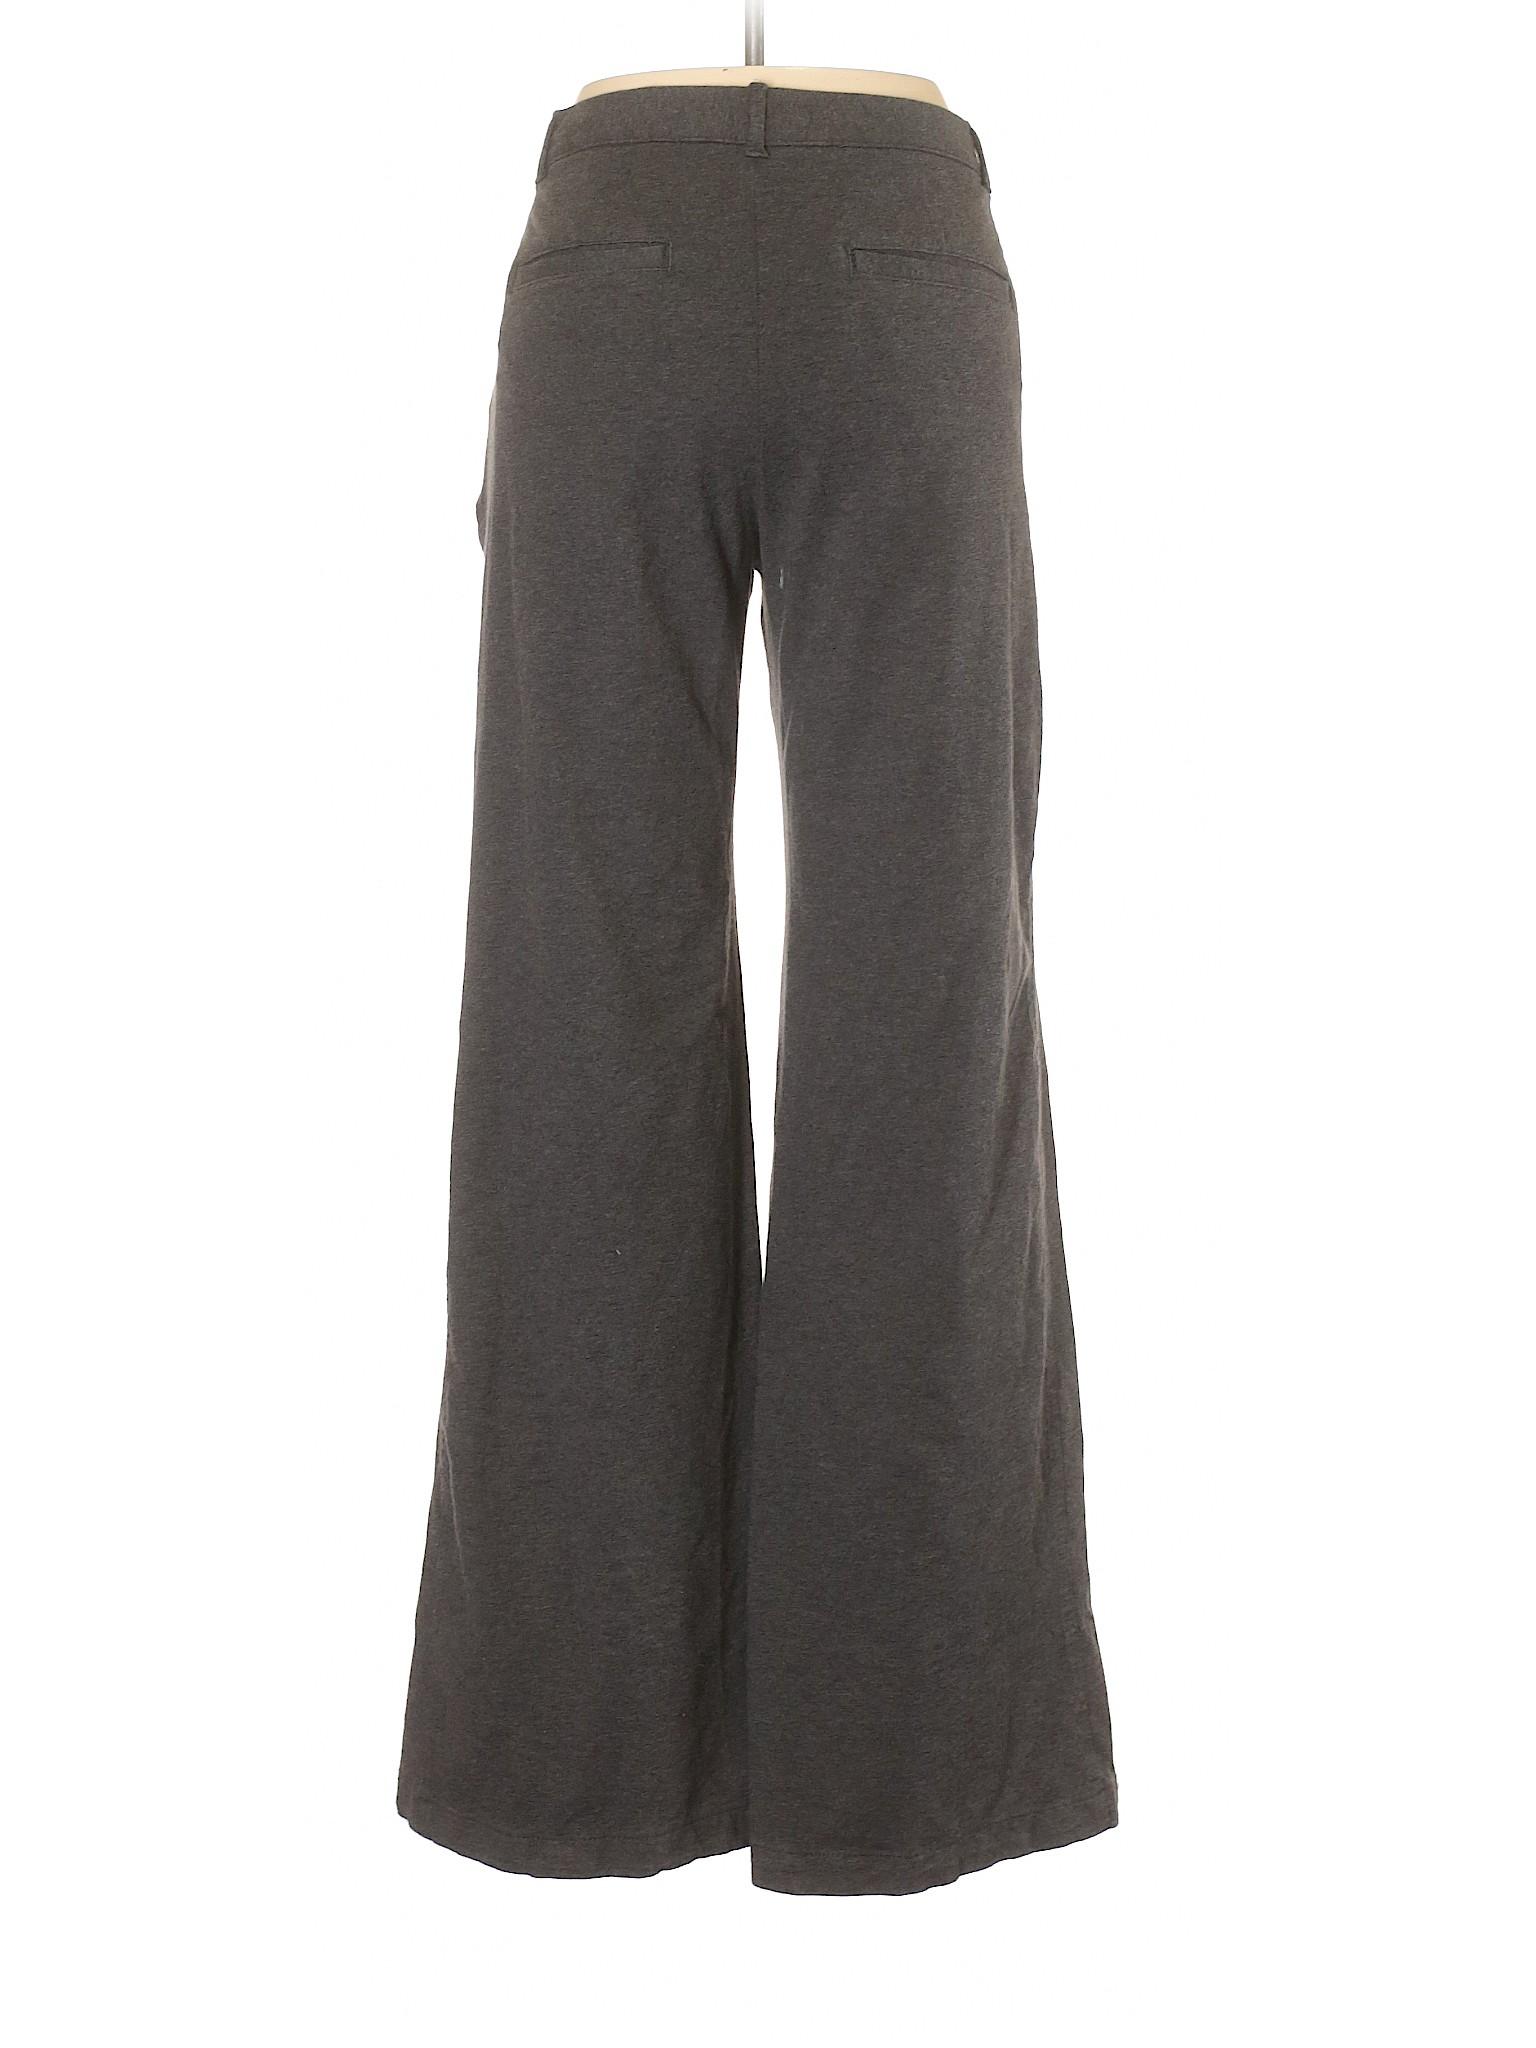 winter Boutique Pants Boutique winter Casual Gap wZqOEdxY